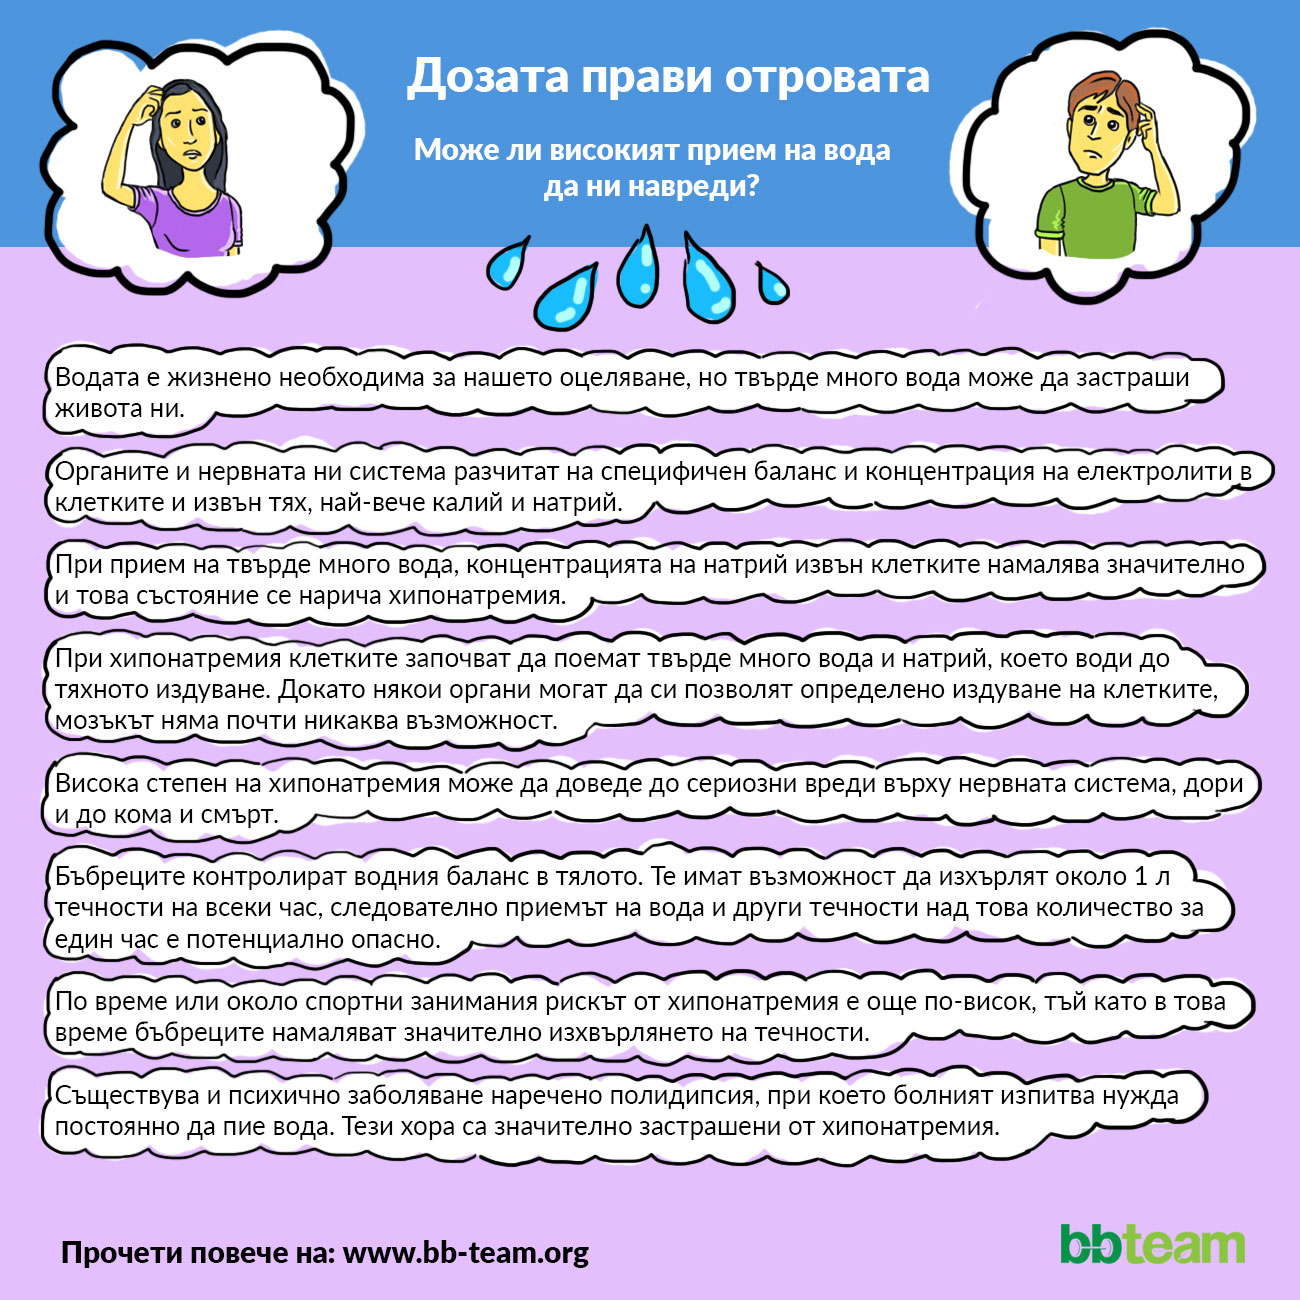 Дозата прави отровата: вода [инфографика]